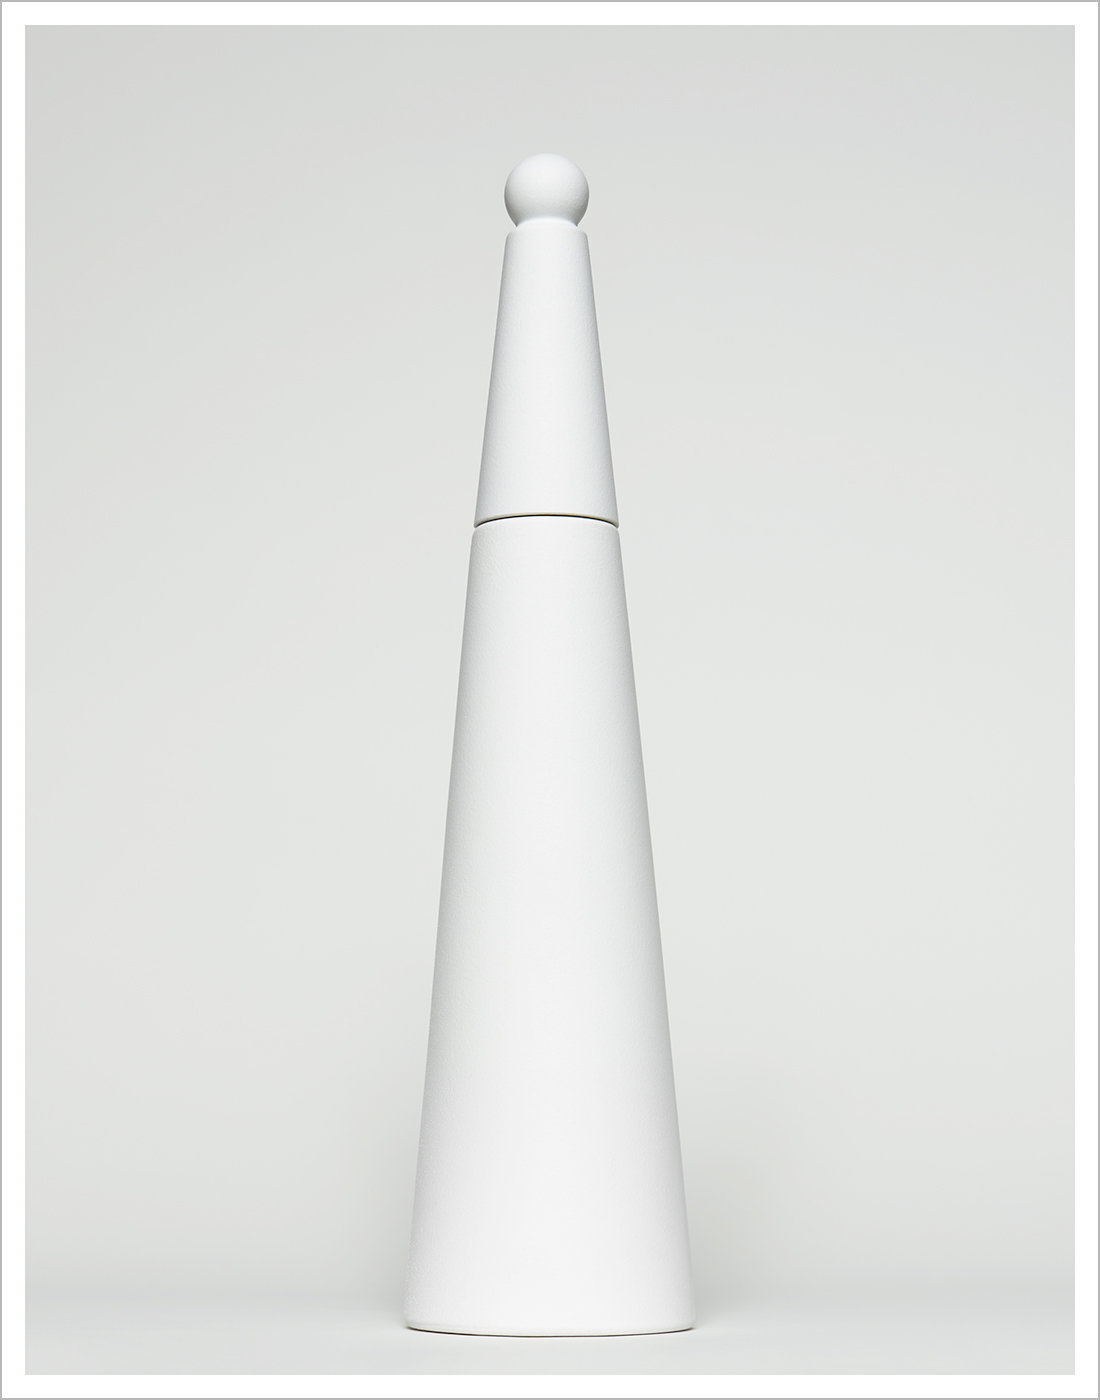 219_WHITE_PERFUME_02_038_v1_11X14_lr.jpg